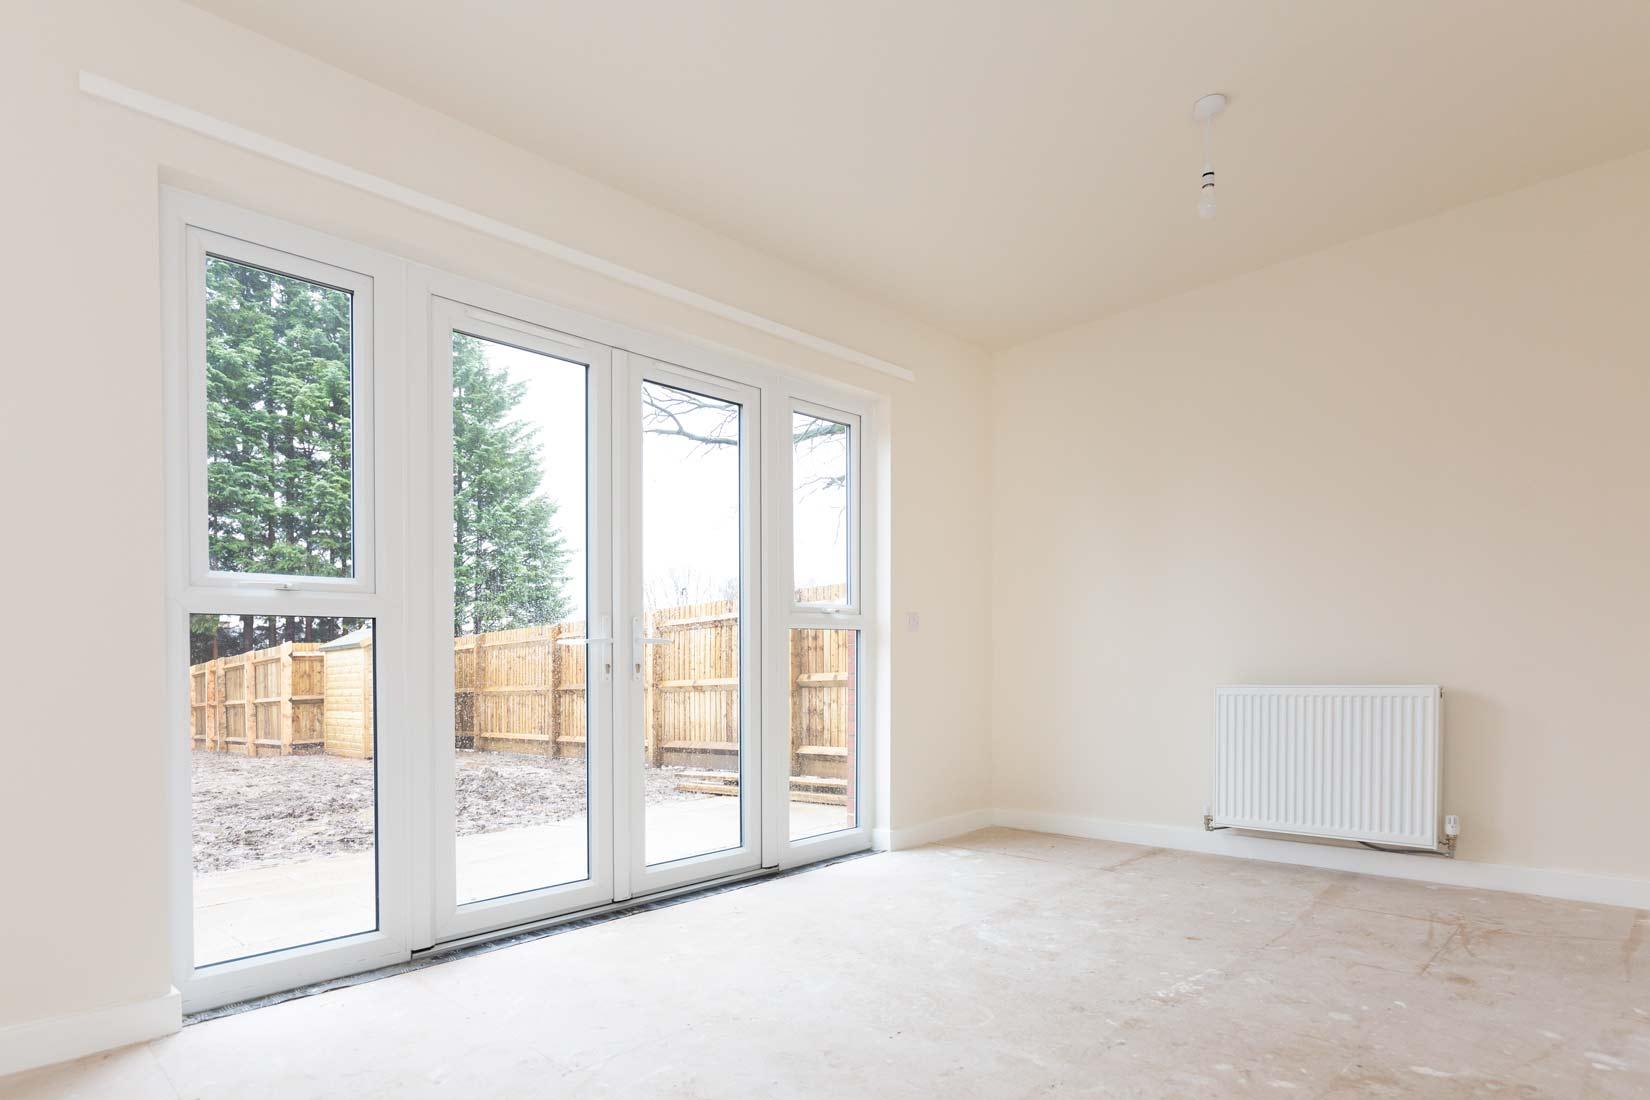 Sitting-interior-new-housing-development-unfurnished